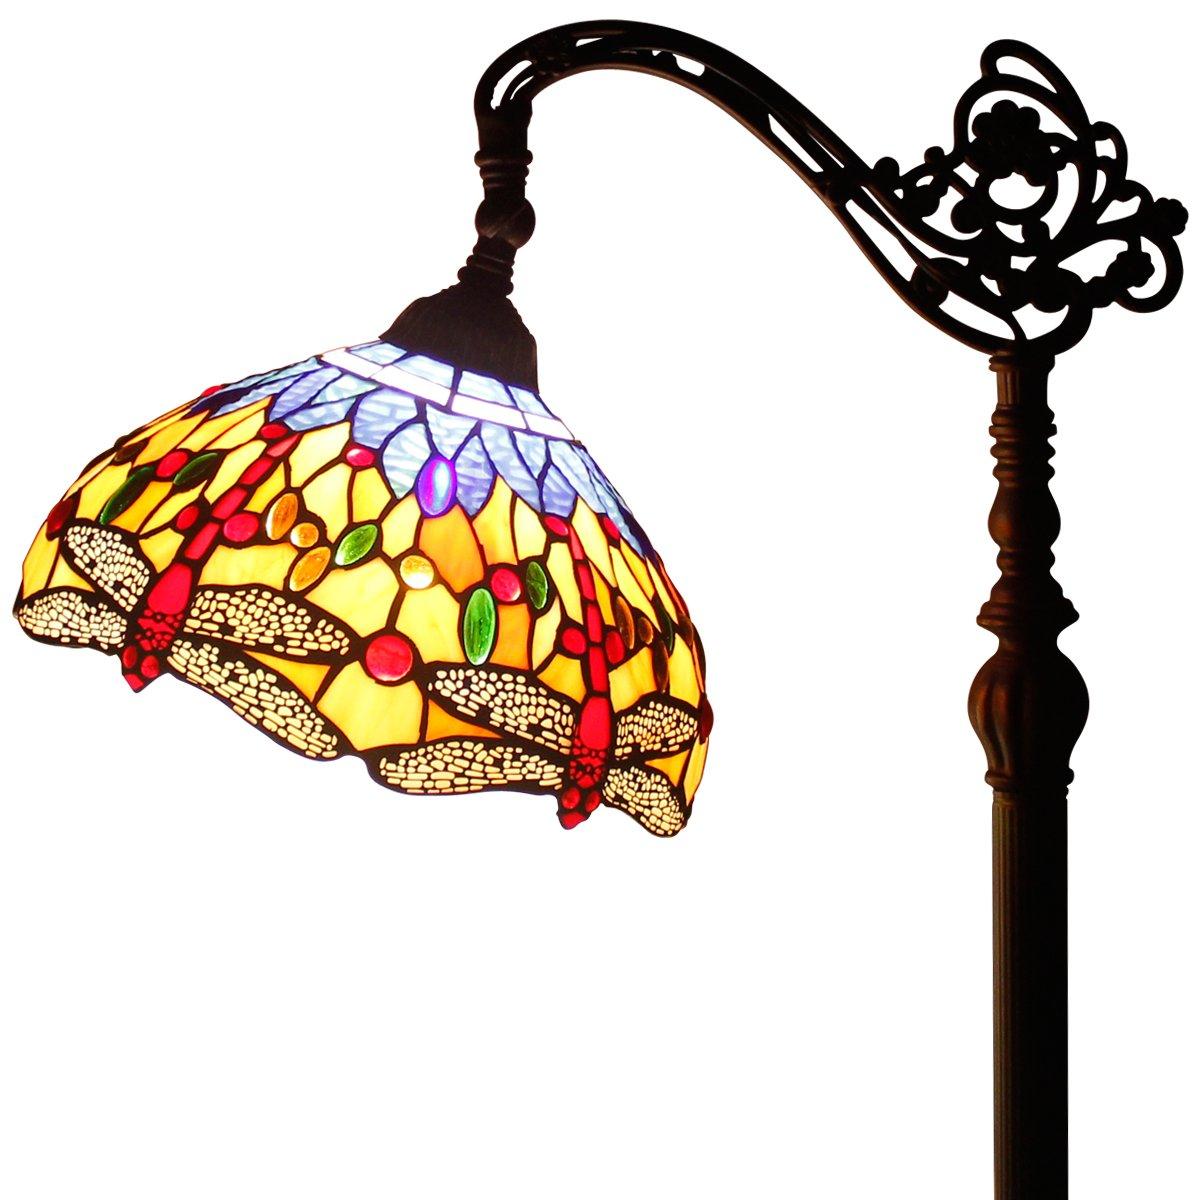 Tiffany Style Reading Floor Lamp Table Desk Lighting Multicolor Shade W12H64 E26